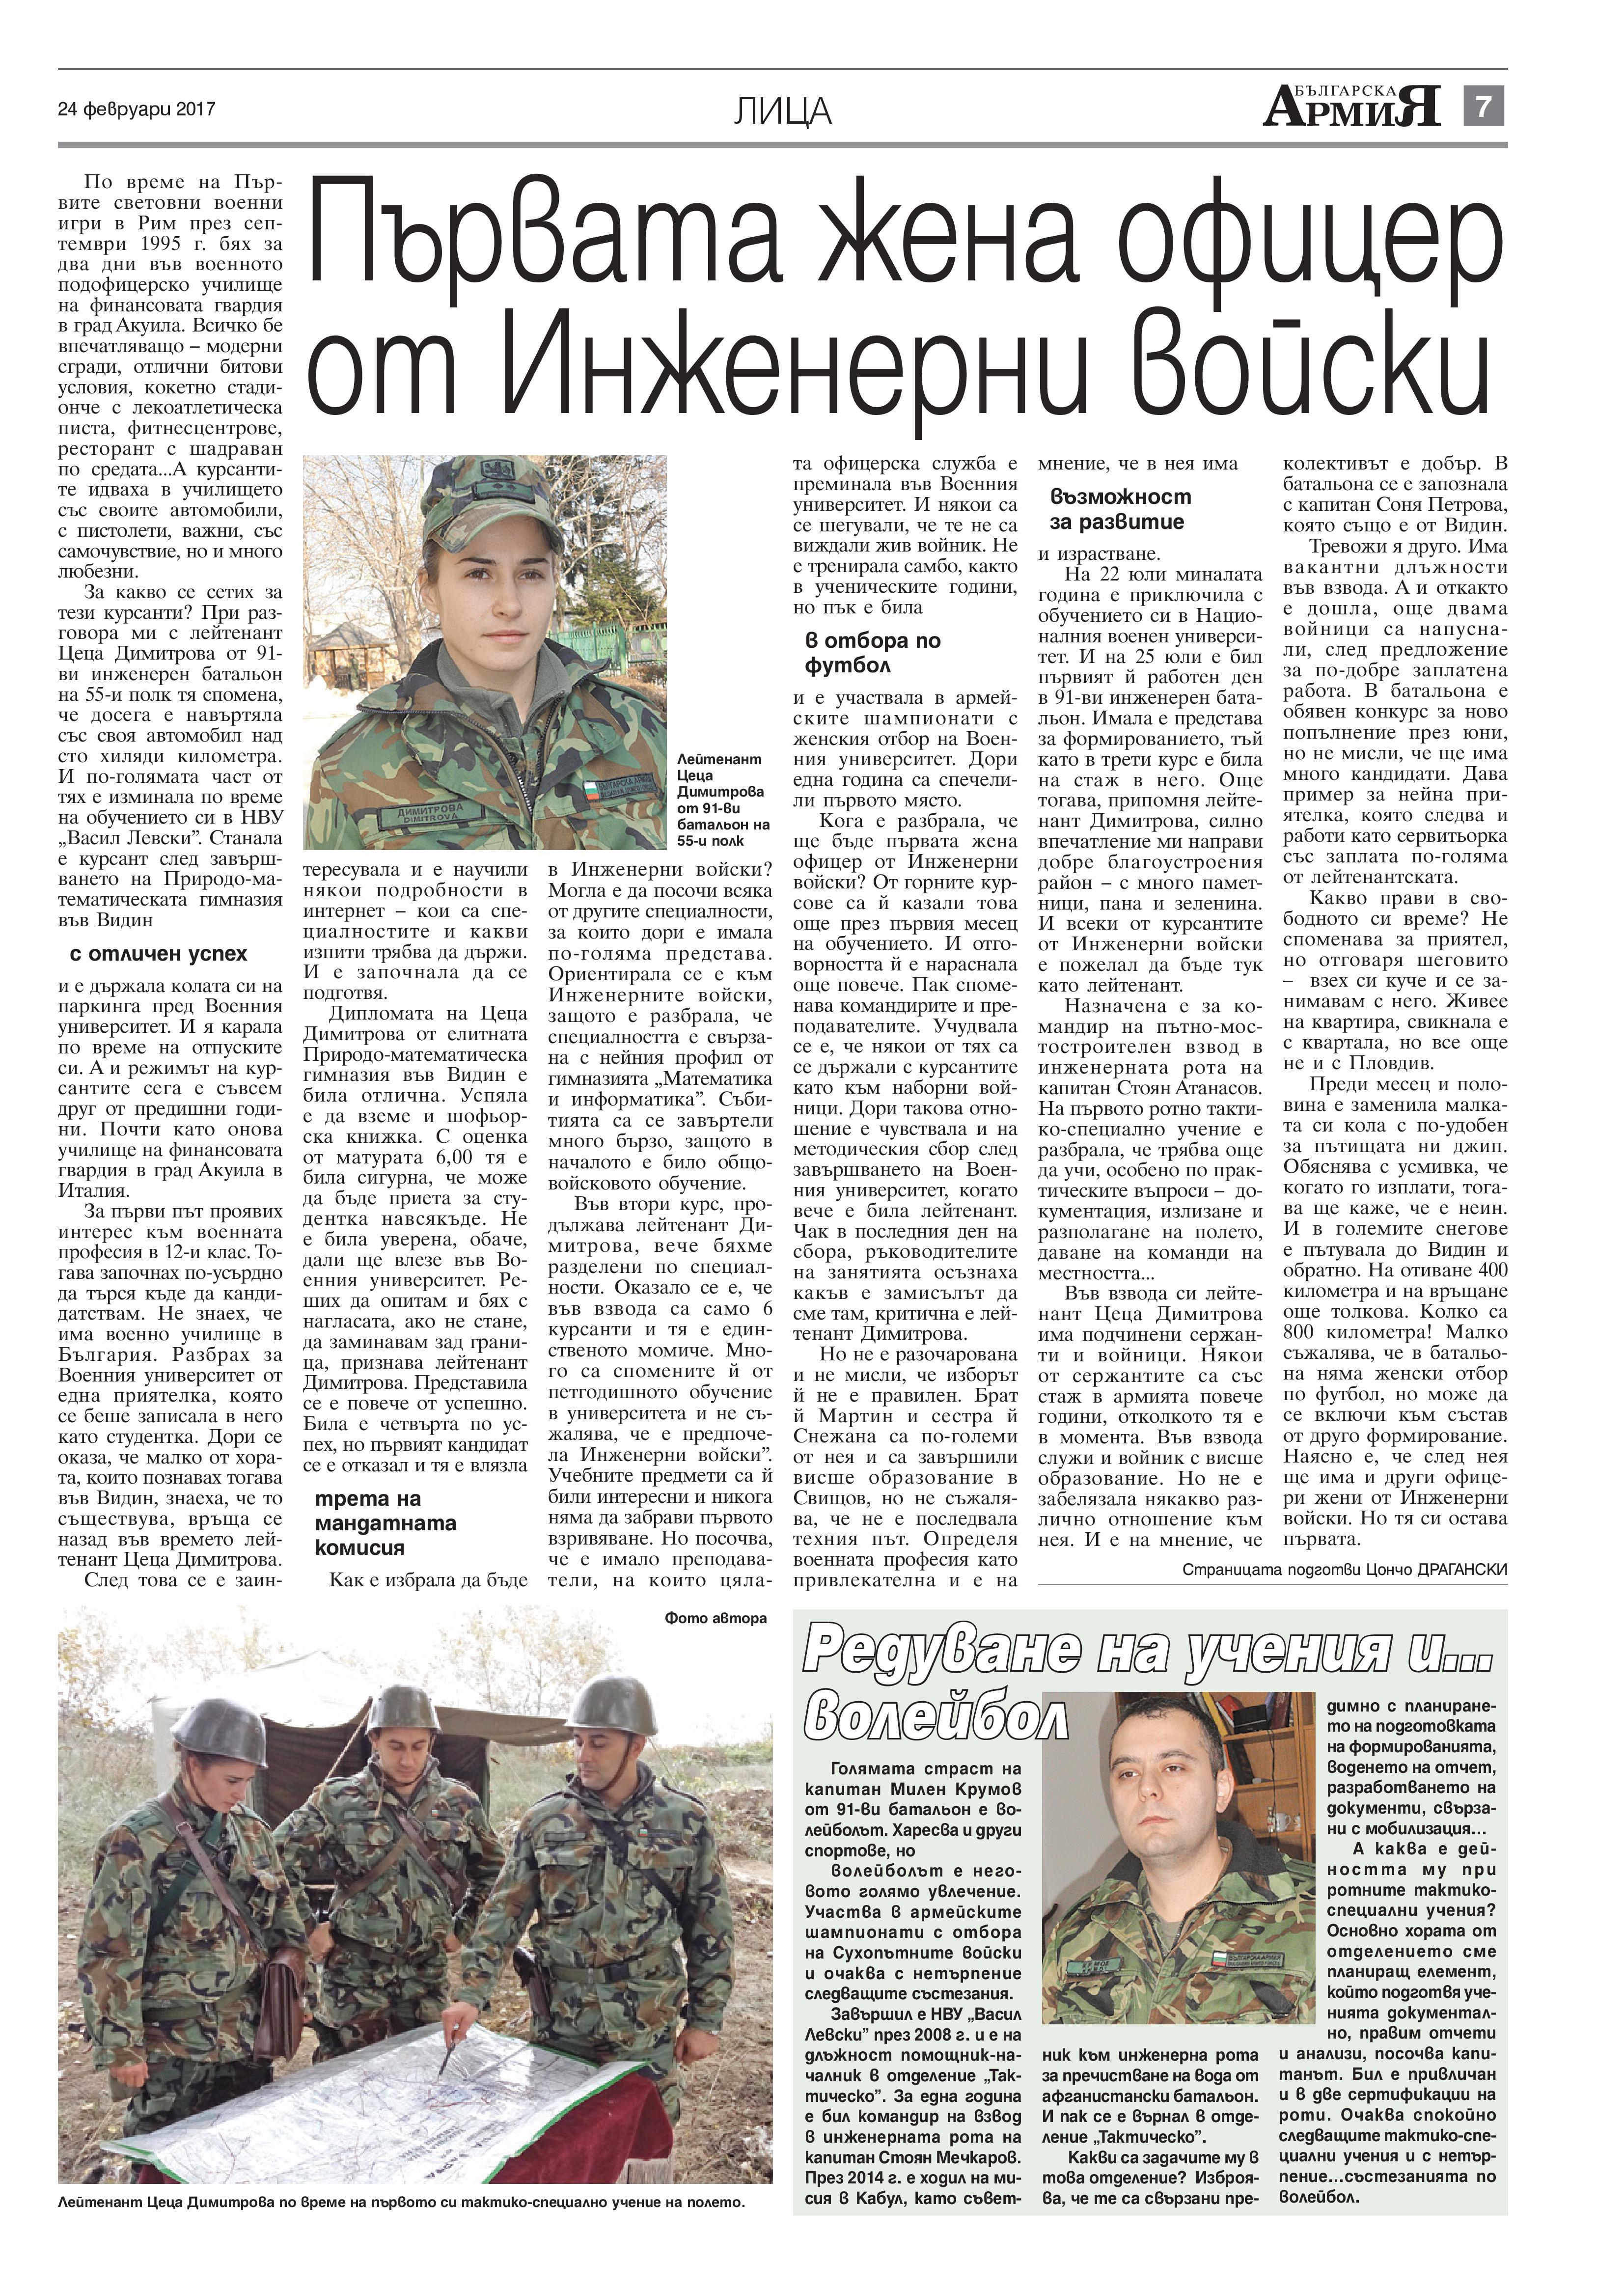 https://www.armymedia.bg/wp-content/uploads/2017/02/07-1.jpg